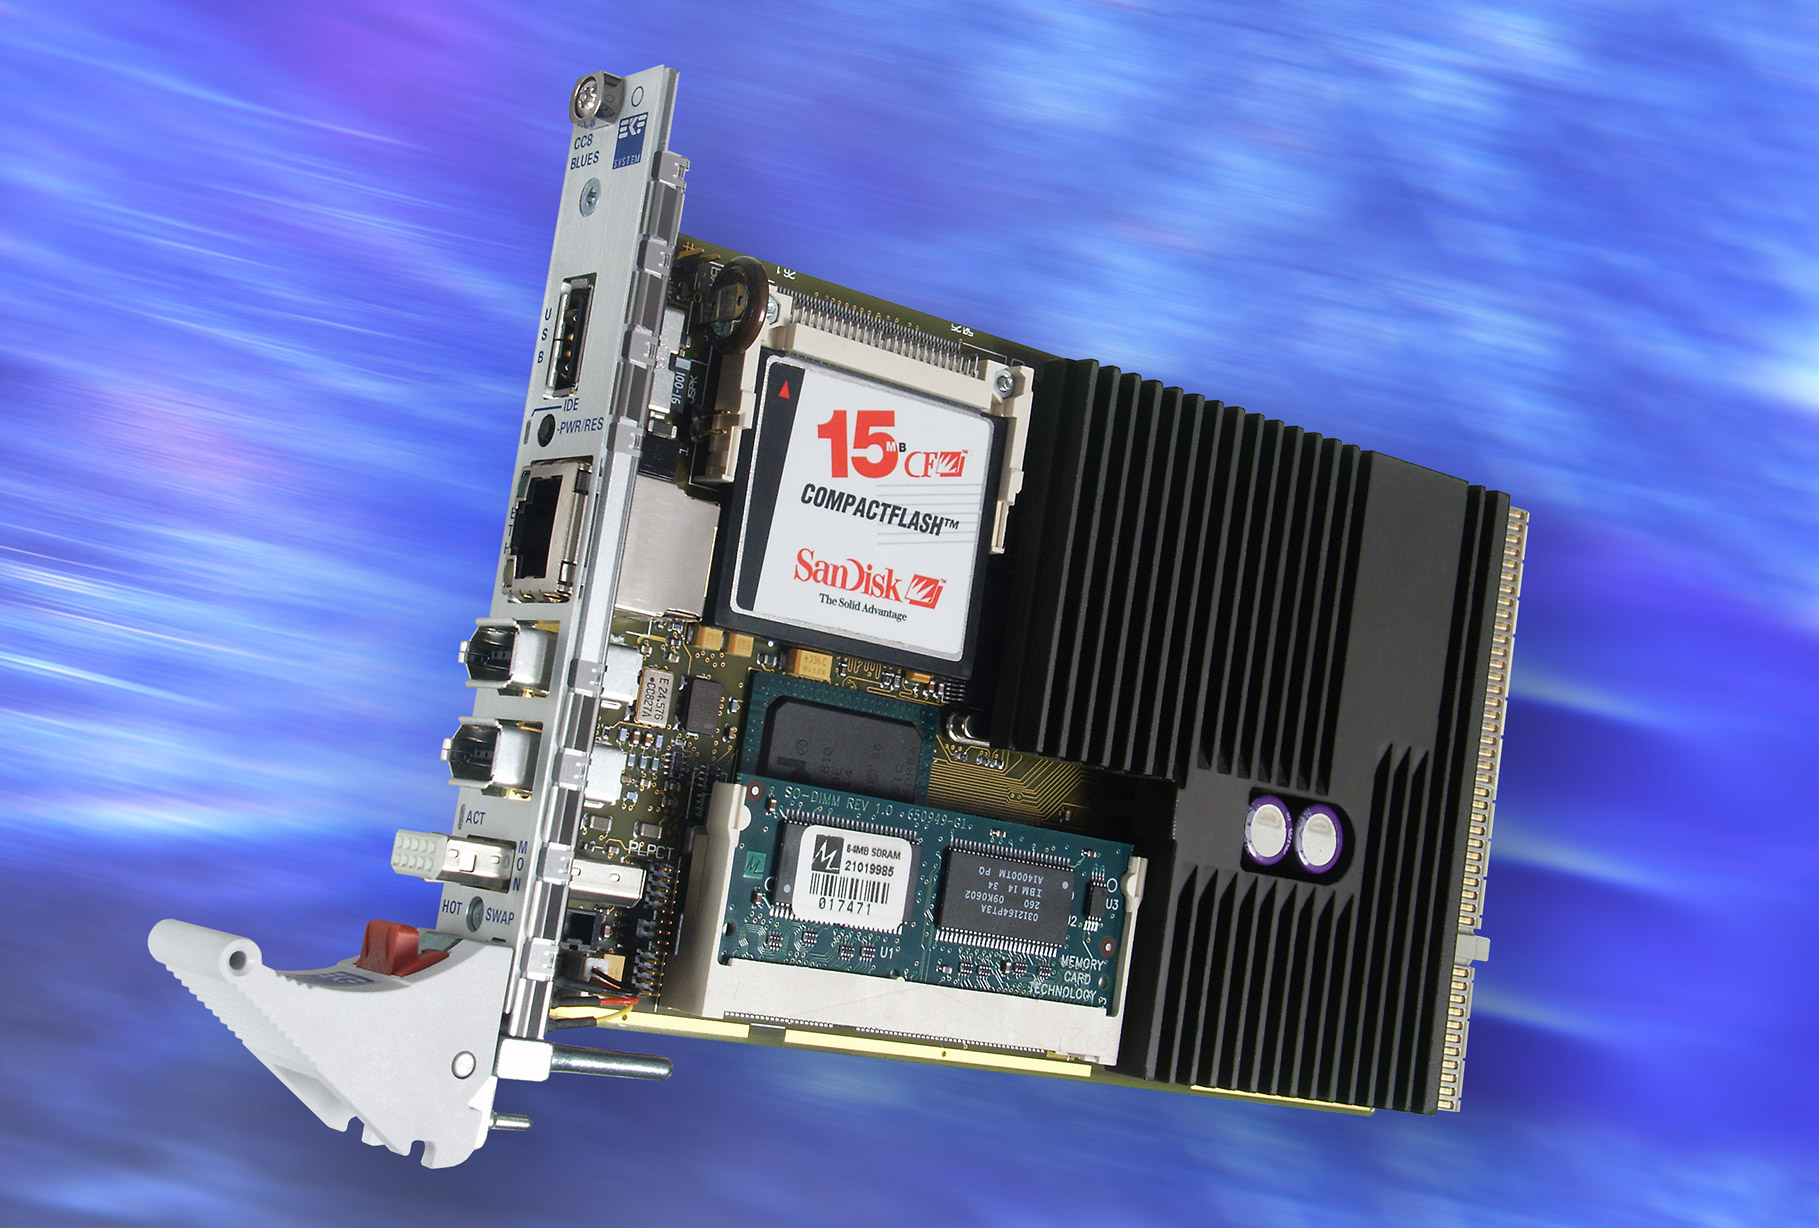 intelr 82802 firmware hub device drivers download